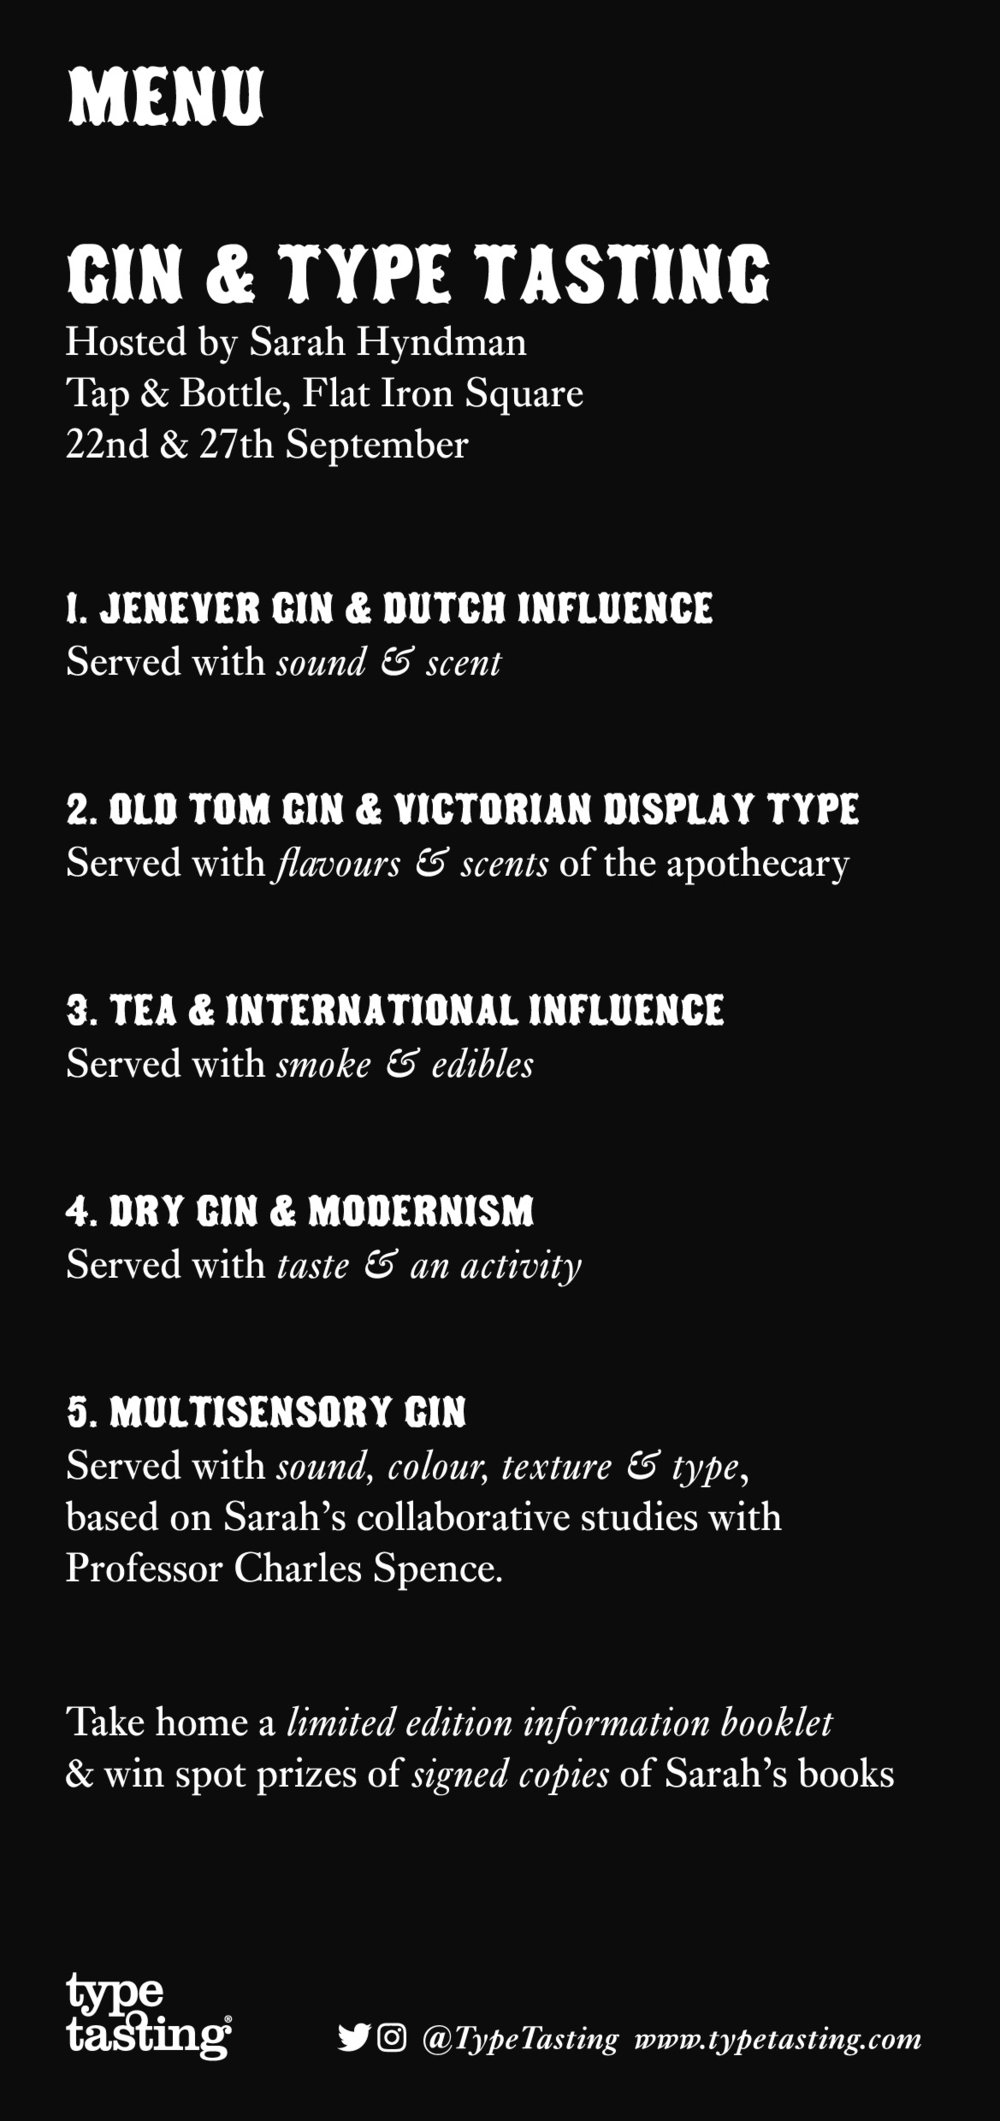 Gin & Type Tasting menu